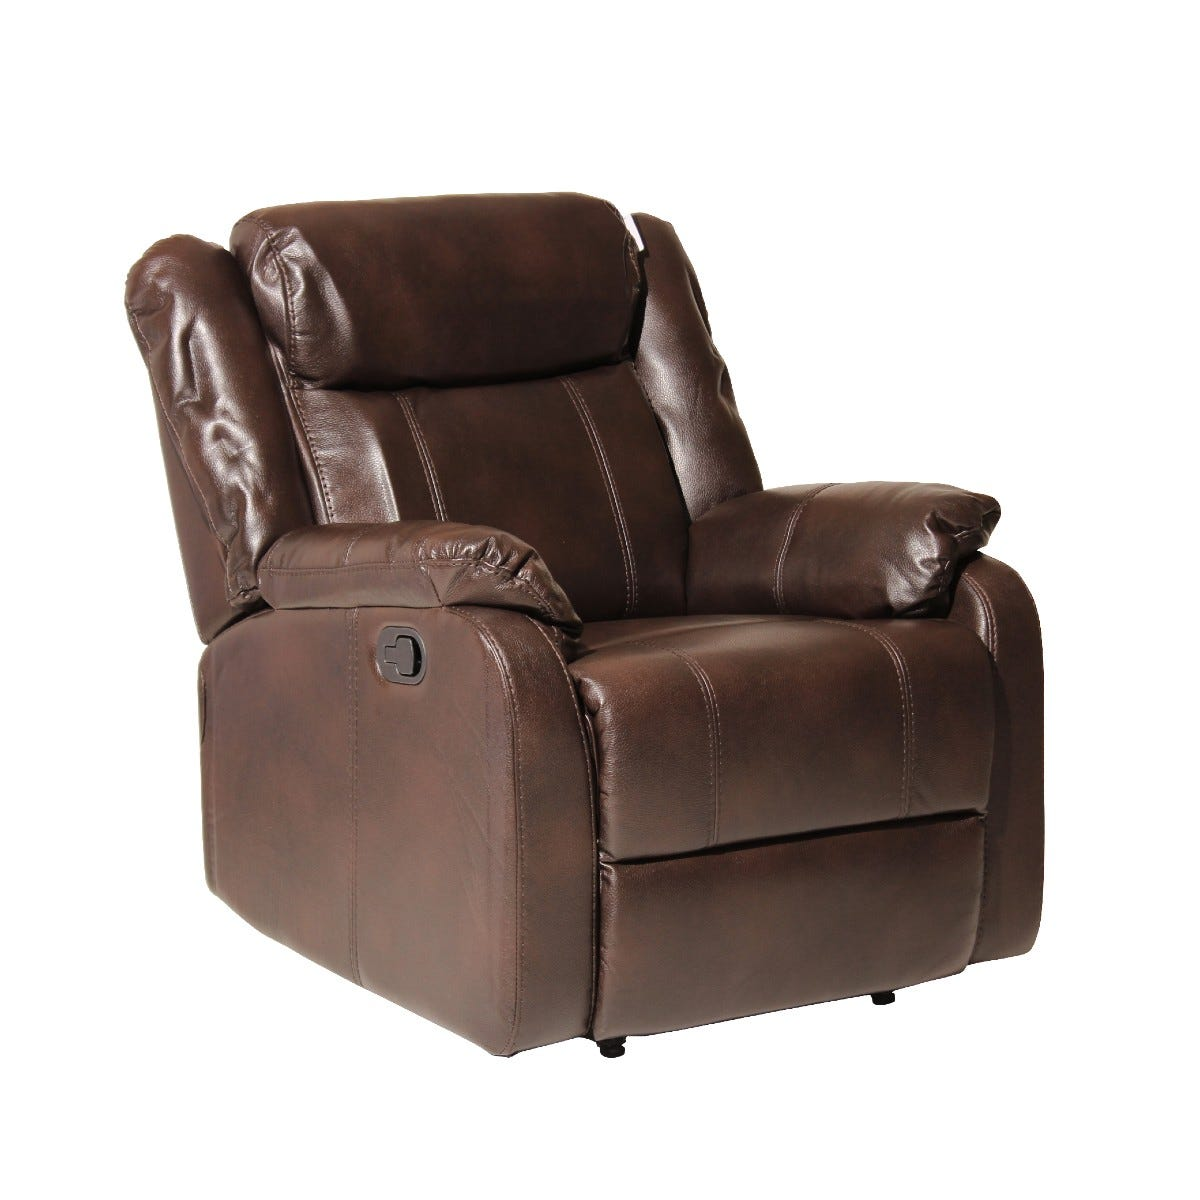 Ledbury Faux Leather Reclining Armchair Brown